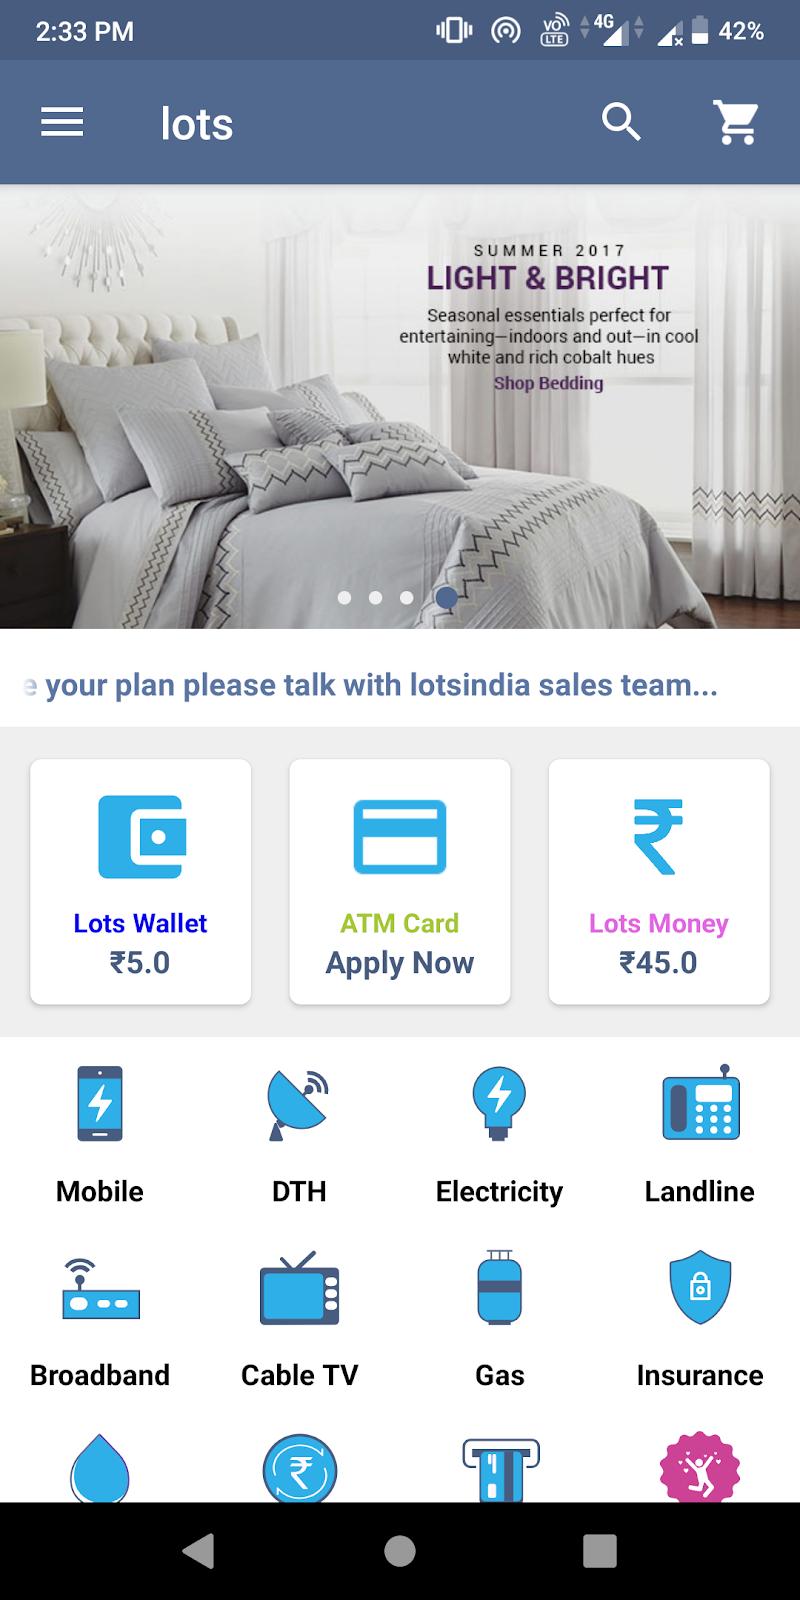 Lots App Loot: get 50 when you register the lots app